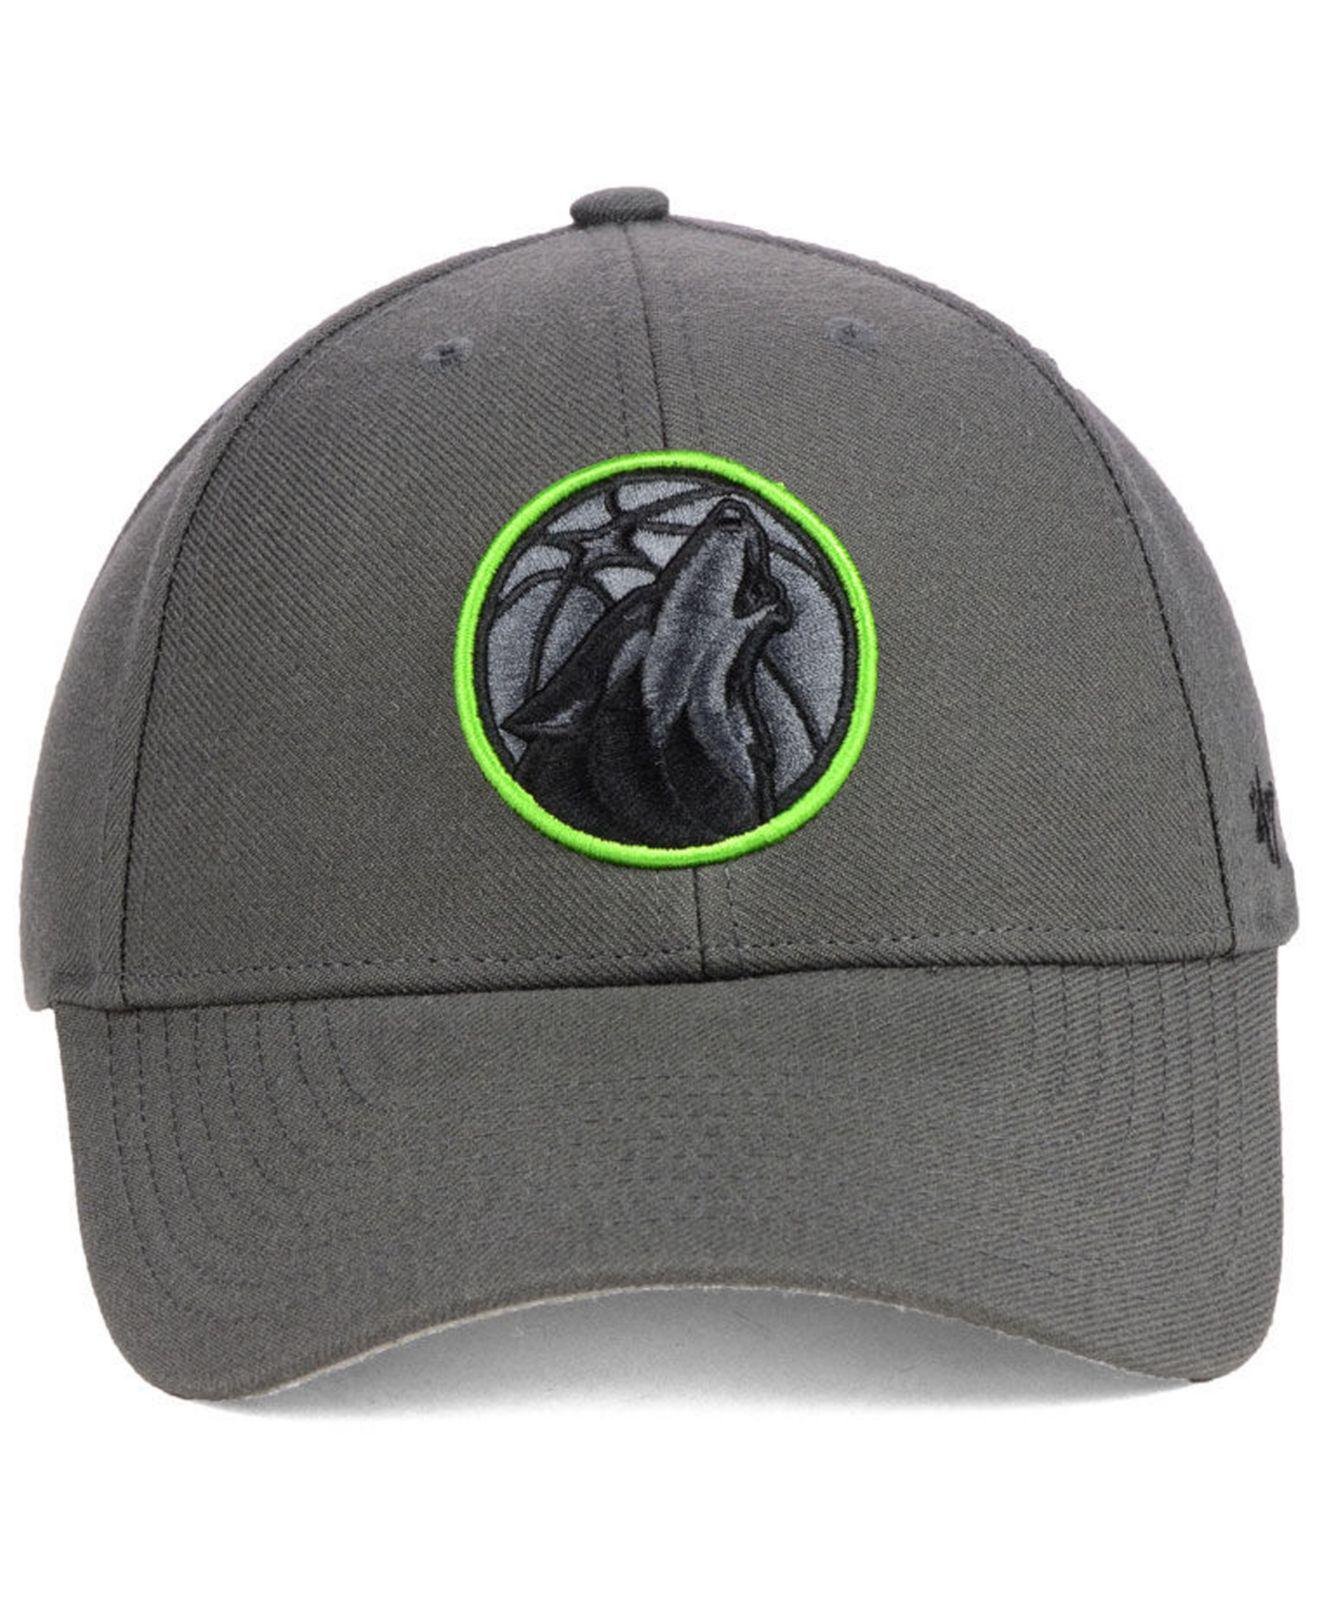 best cheap 7c416 9893e ... purchase lyst 47 brand minnesota timberwolves charcoal pop mvp cap in  gray for men 2db37 a2b48